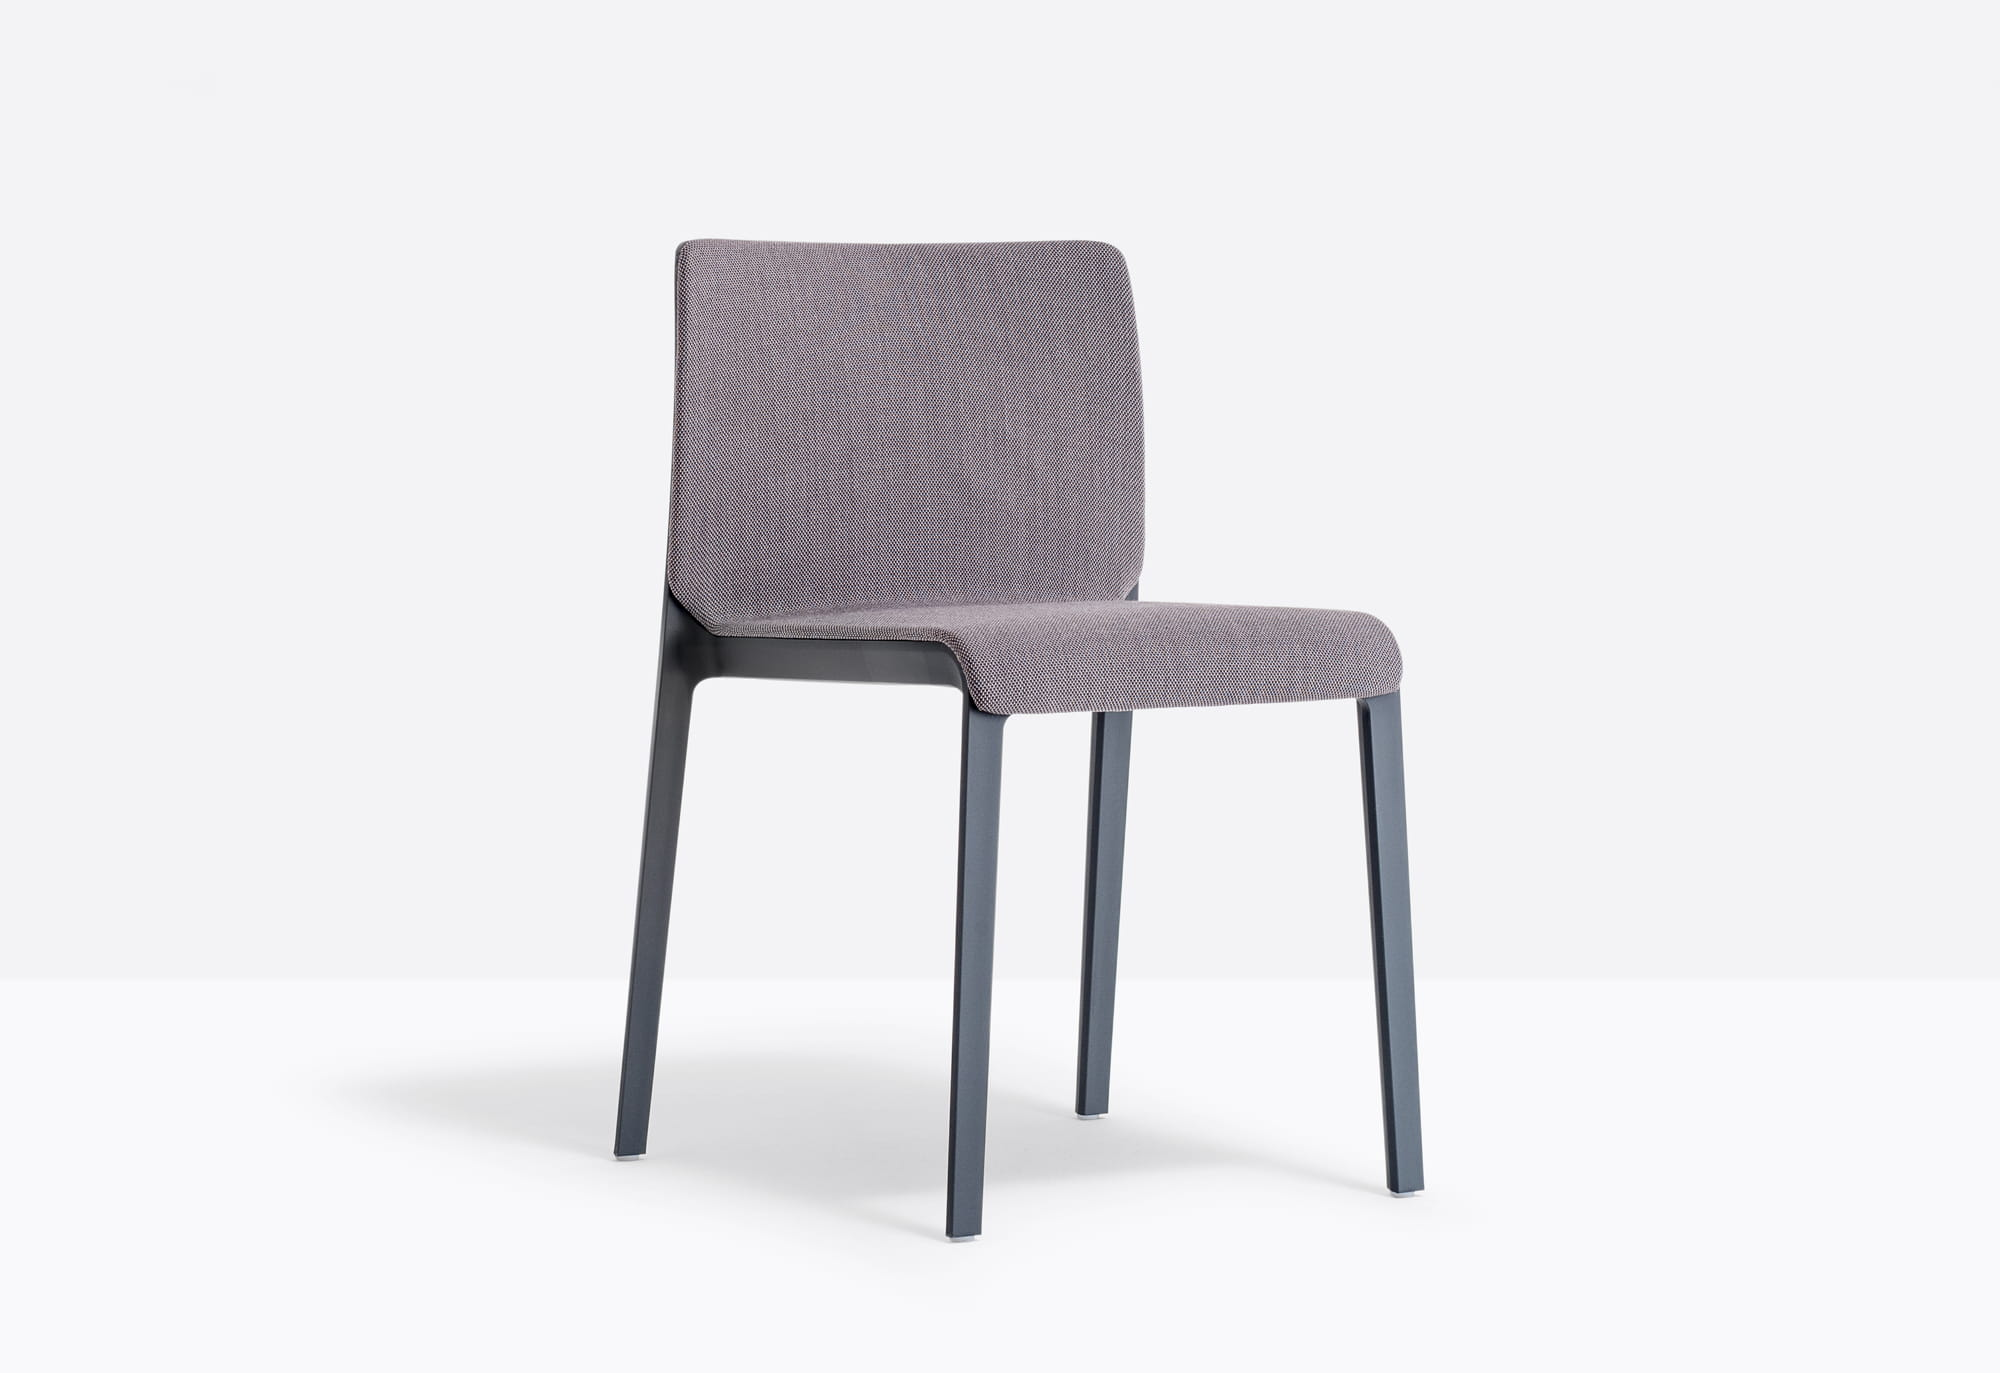 Pedrali Krzesło Volt 671 Antracyt